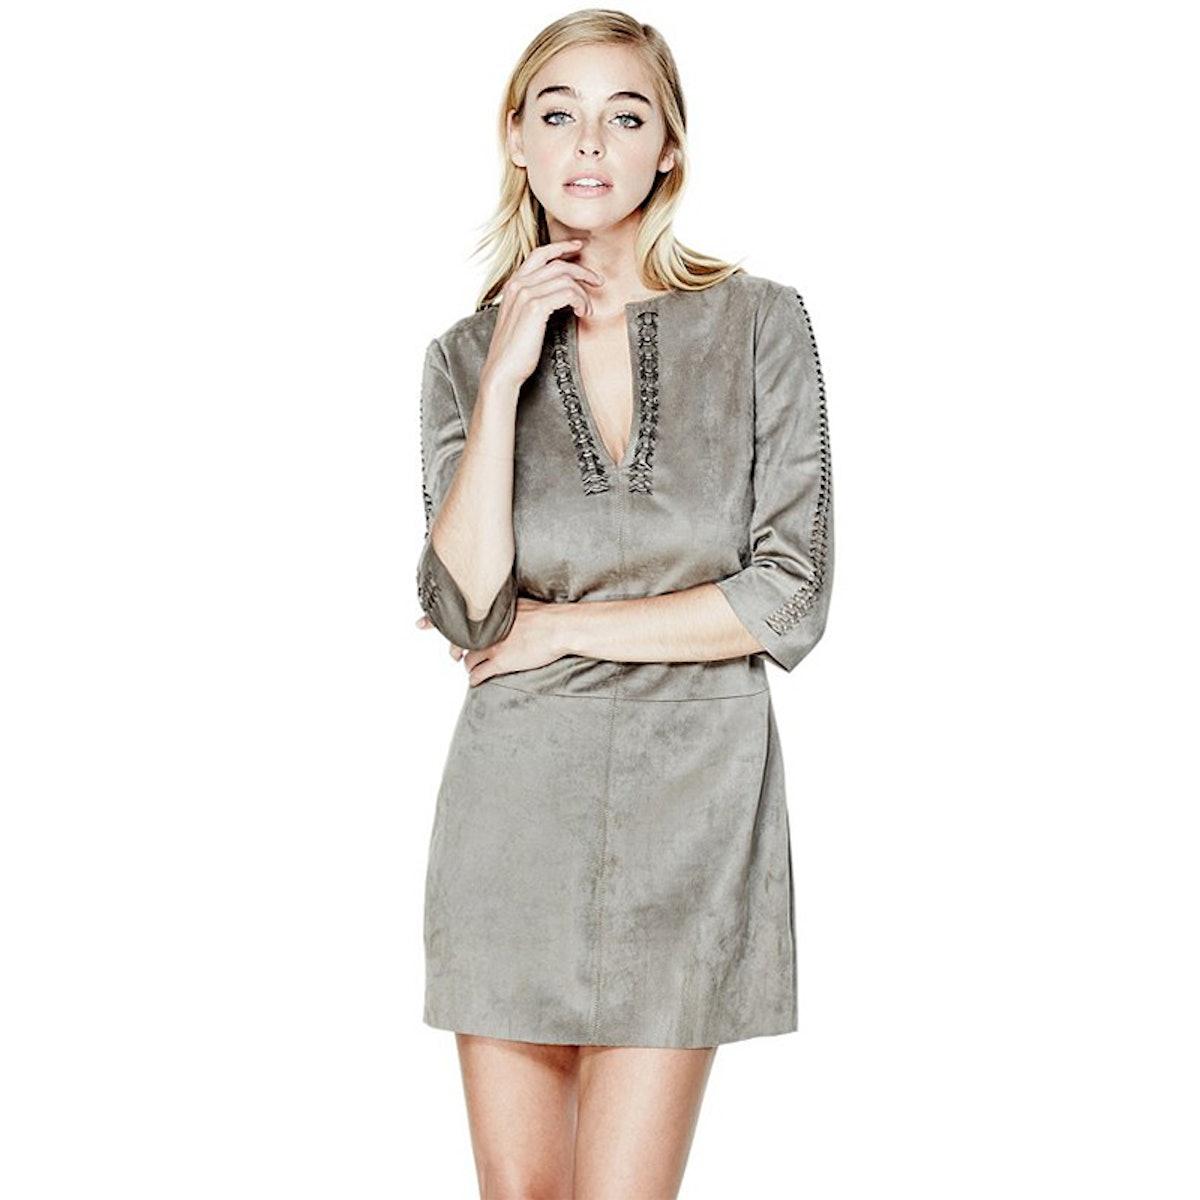 Bellaire Three-Quarter Sleeve Dress